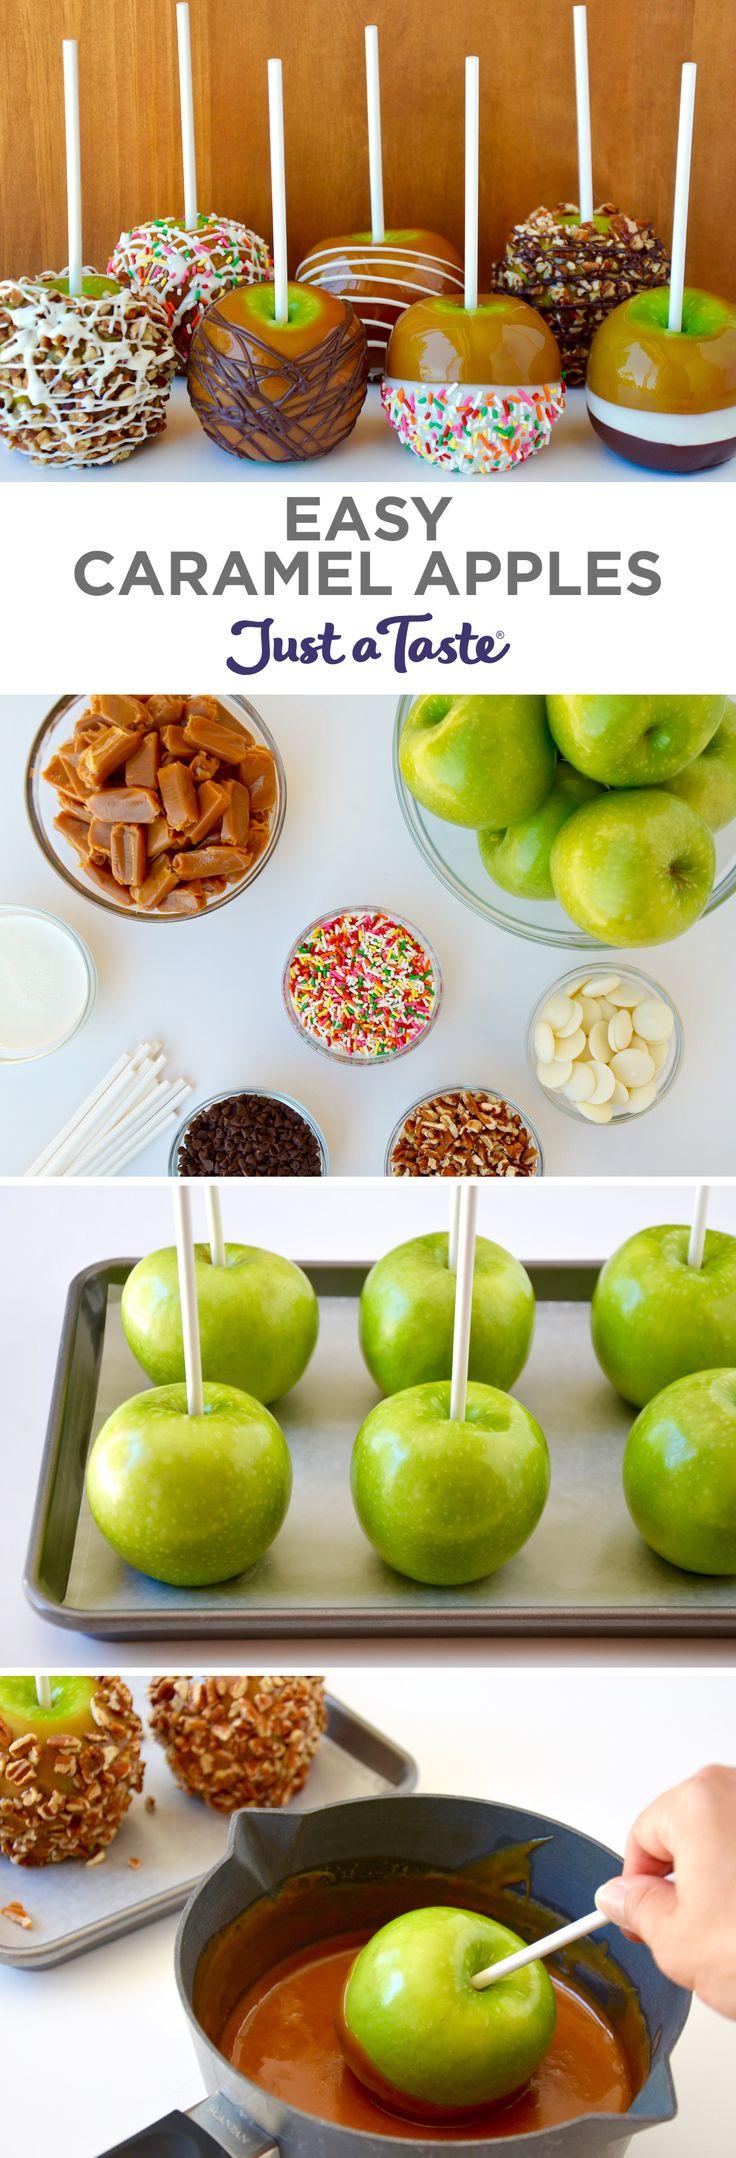 Easy Caramel Apples recipe justataste.com #recipe #apples #fall (Halloween Bake Easy)